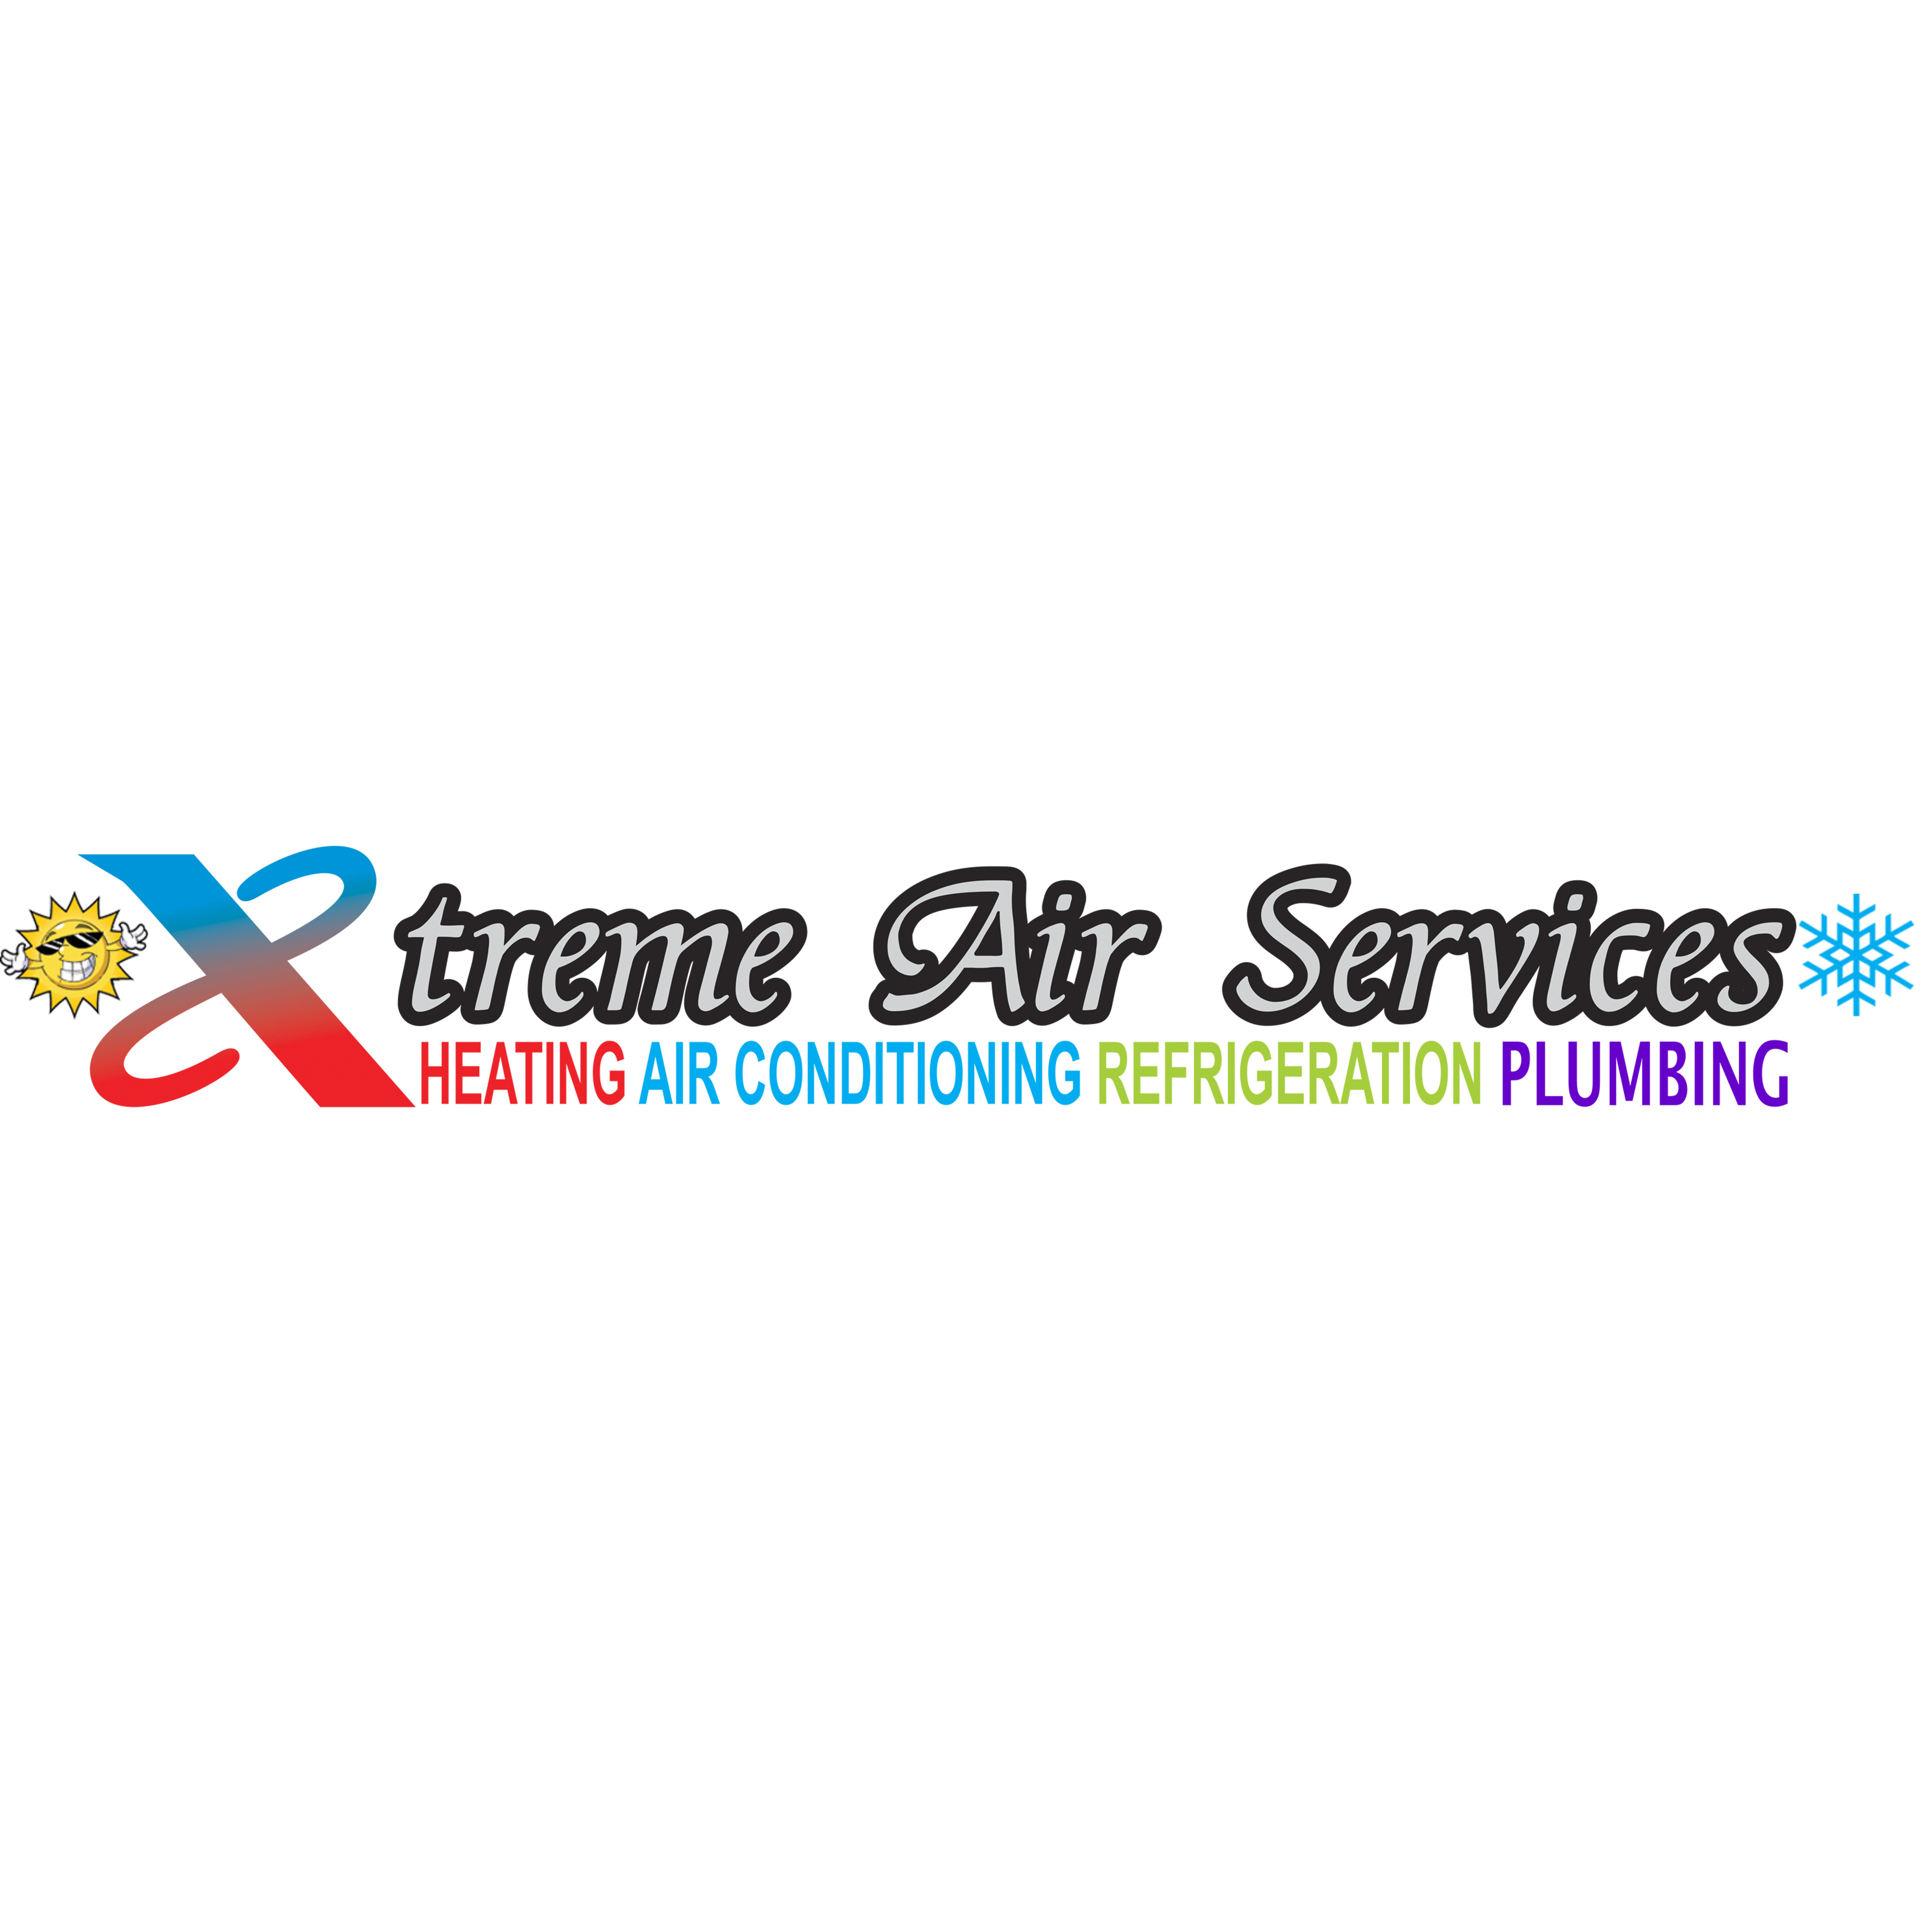 Freestyle xtreme coupon code